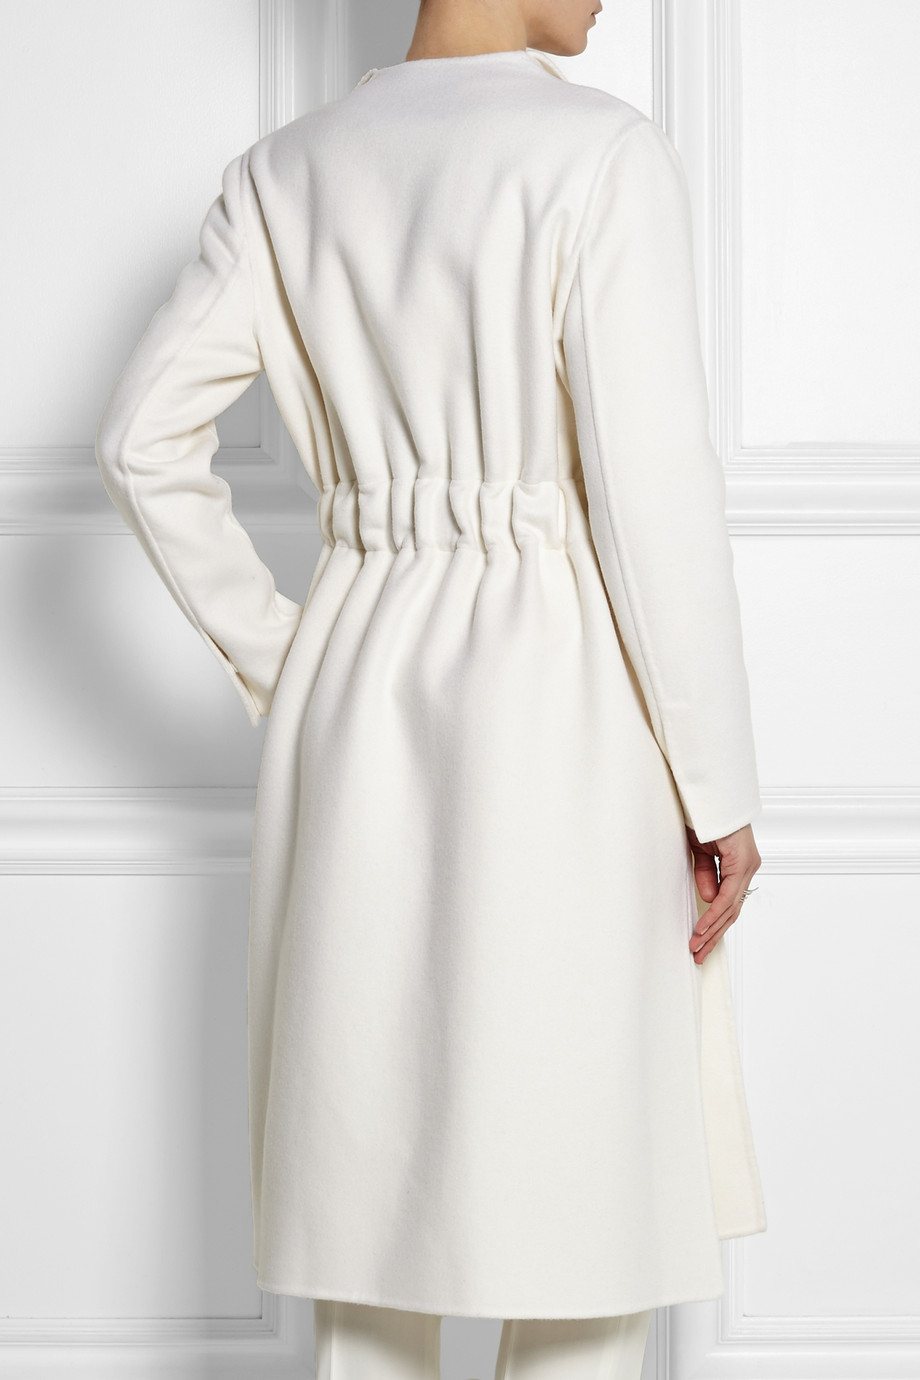 Fendi Cashmere Coat in White | Lyst